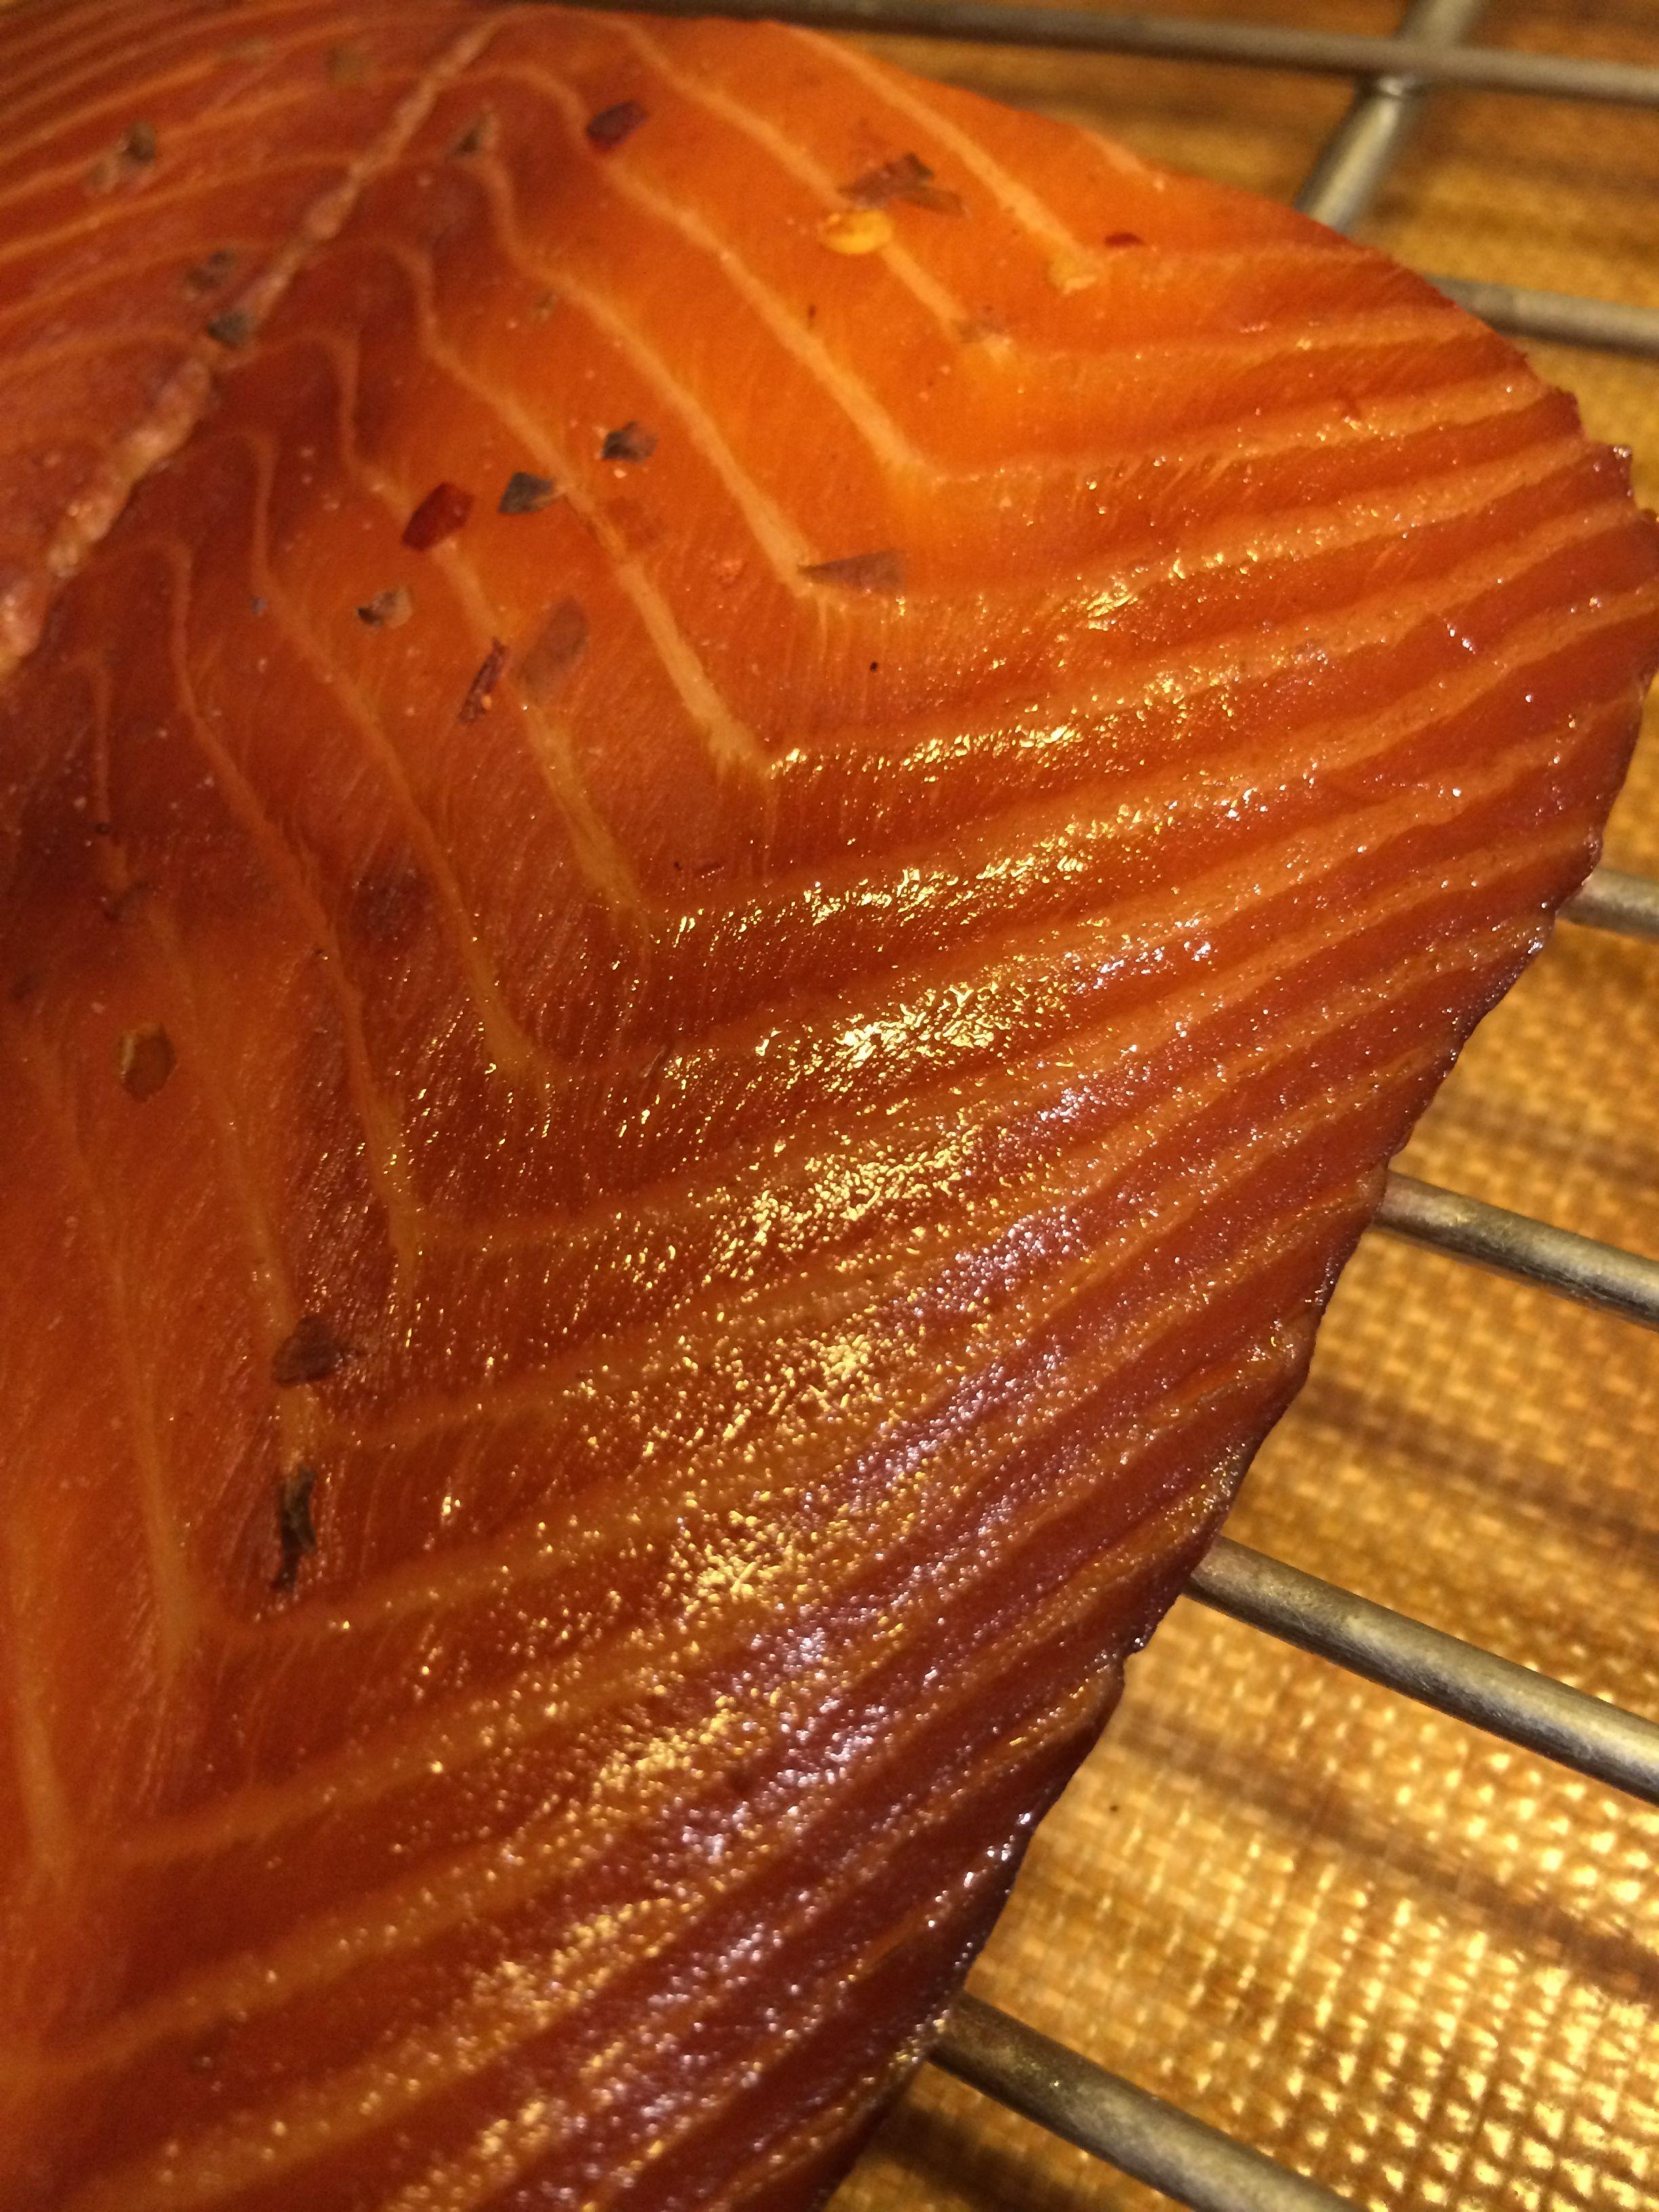 Smoked Salmon And Brine